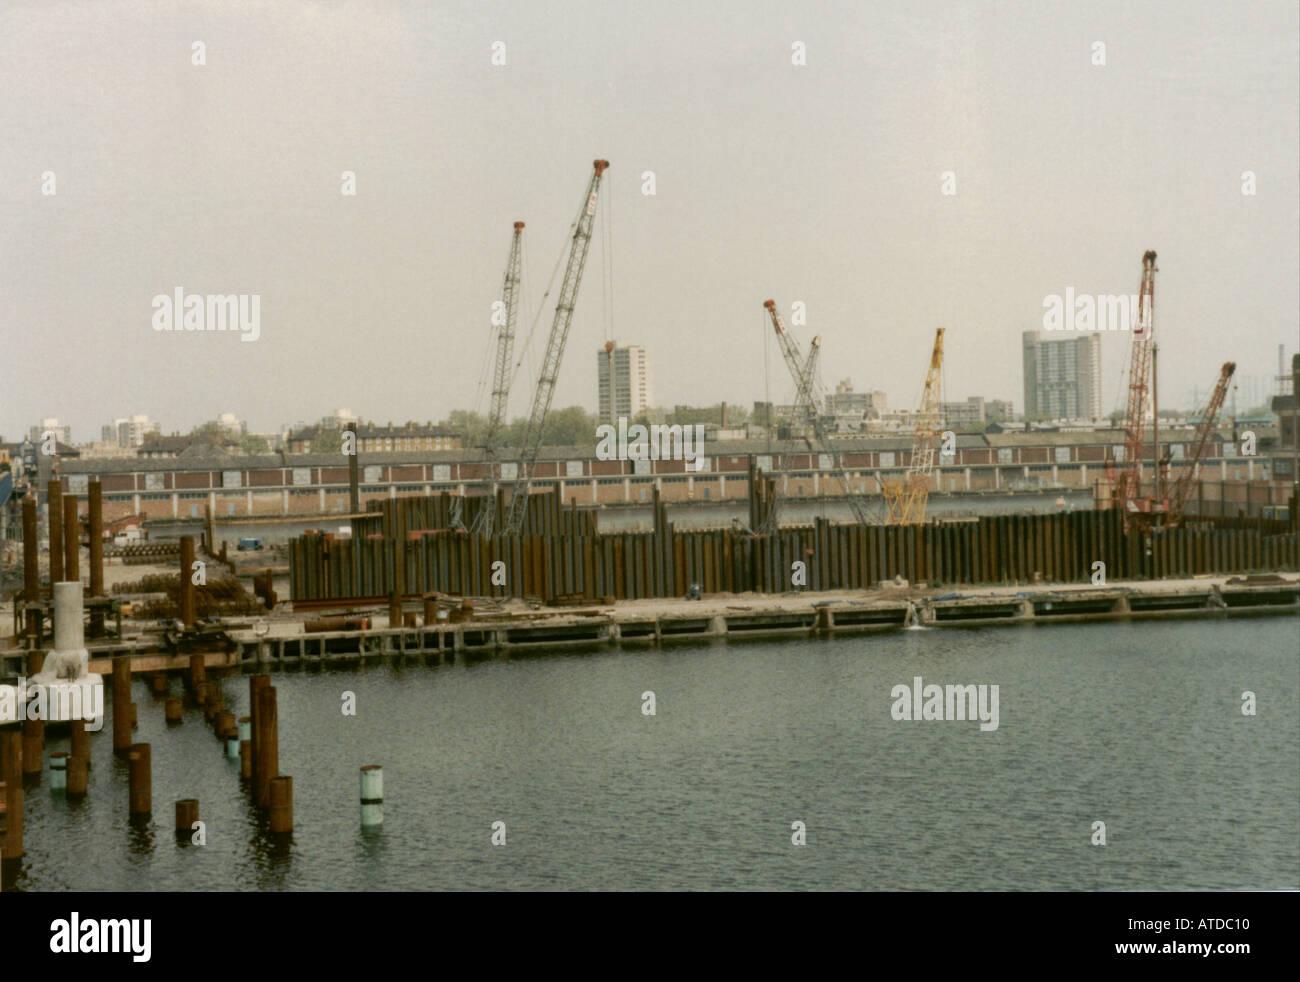 demolition at the docks instructions